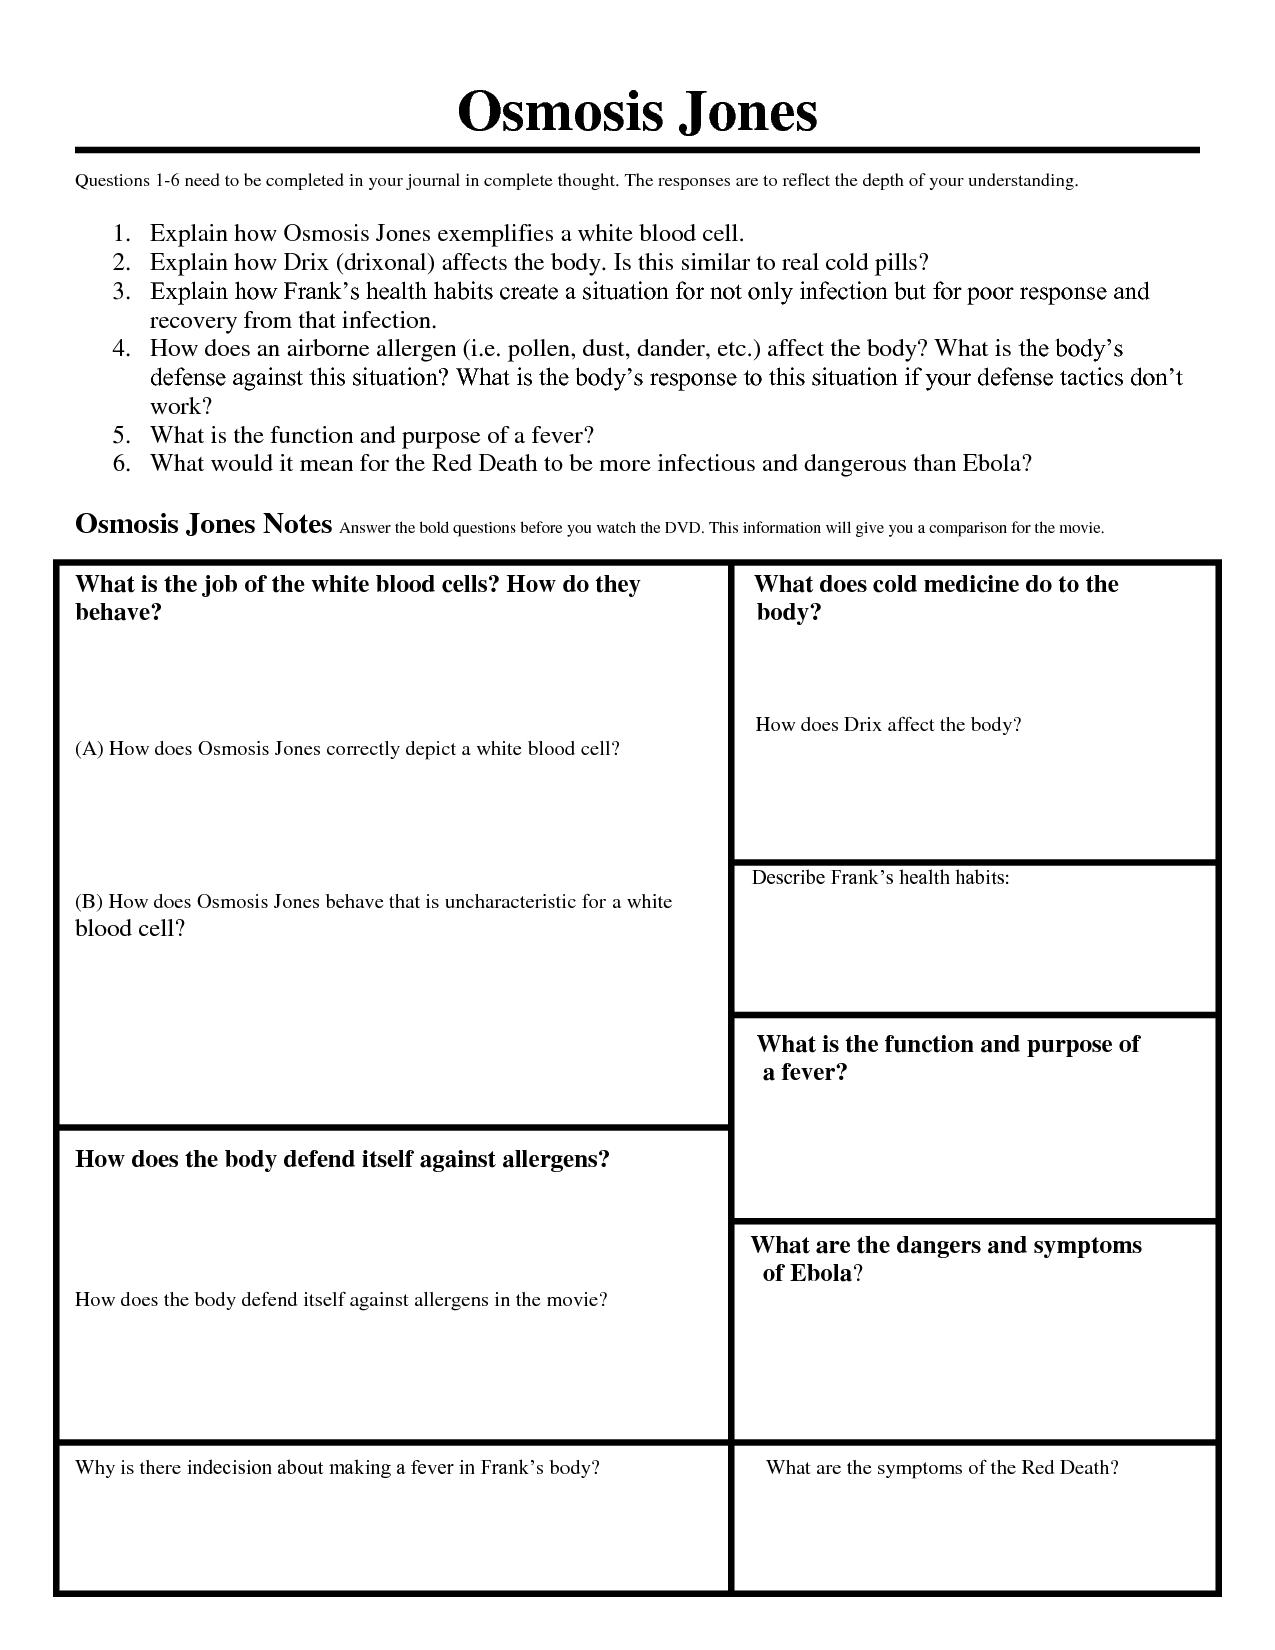 Osmosis Jones Analogies Worksheets Answers